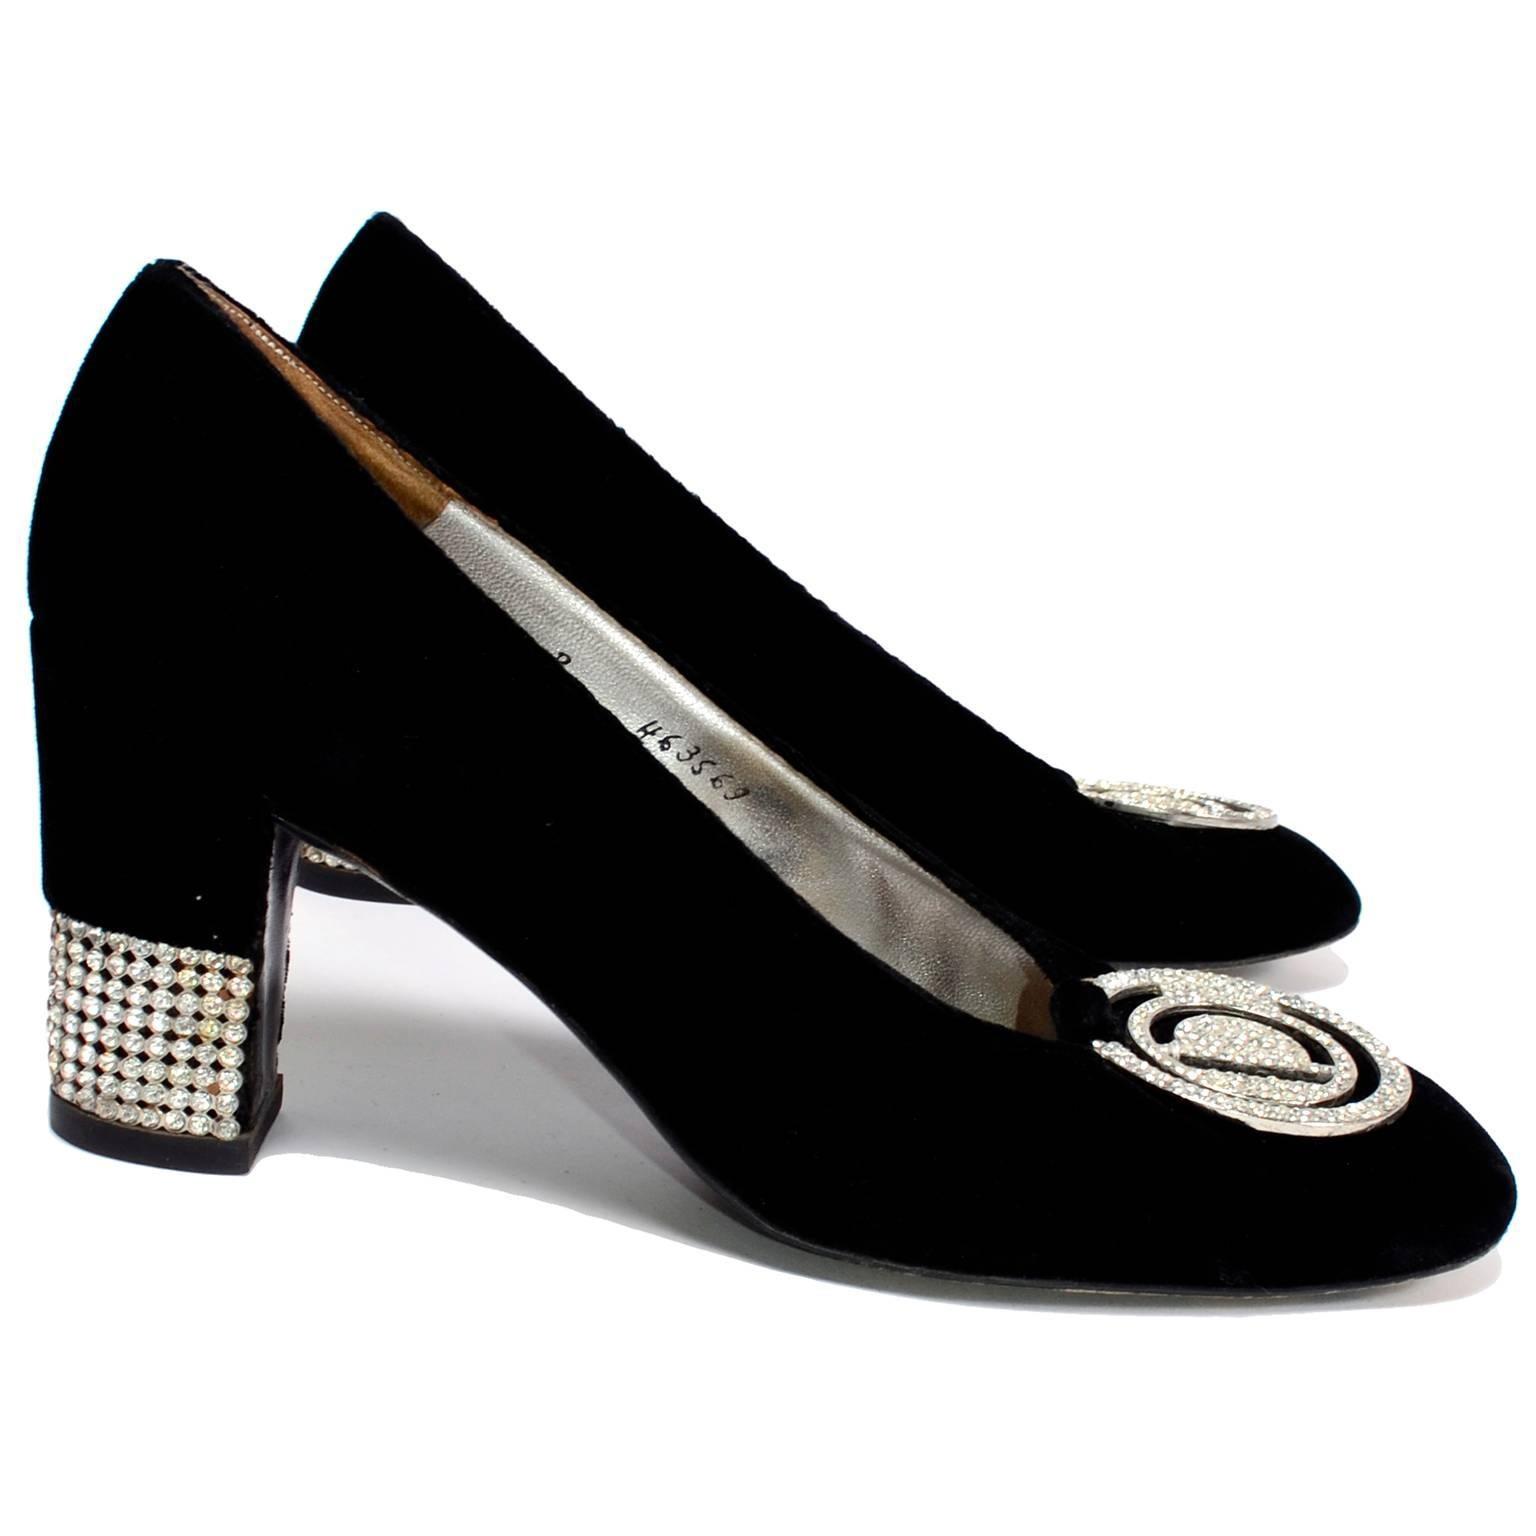 b355946f331da Documented 1968 Christian Dior Black Velvet Rhinestone Heel Shoes w  CD  Buckle For Sale at 1stdibs